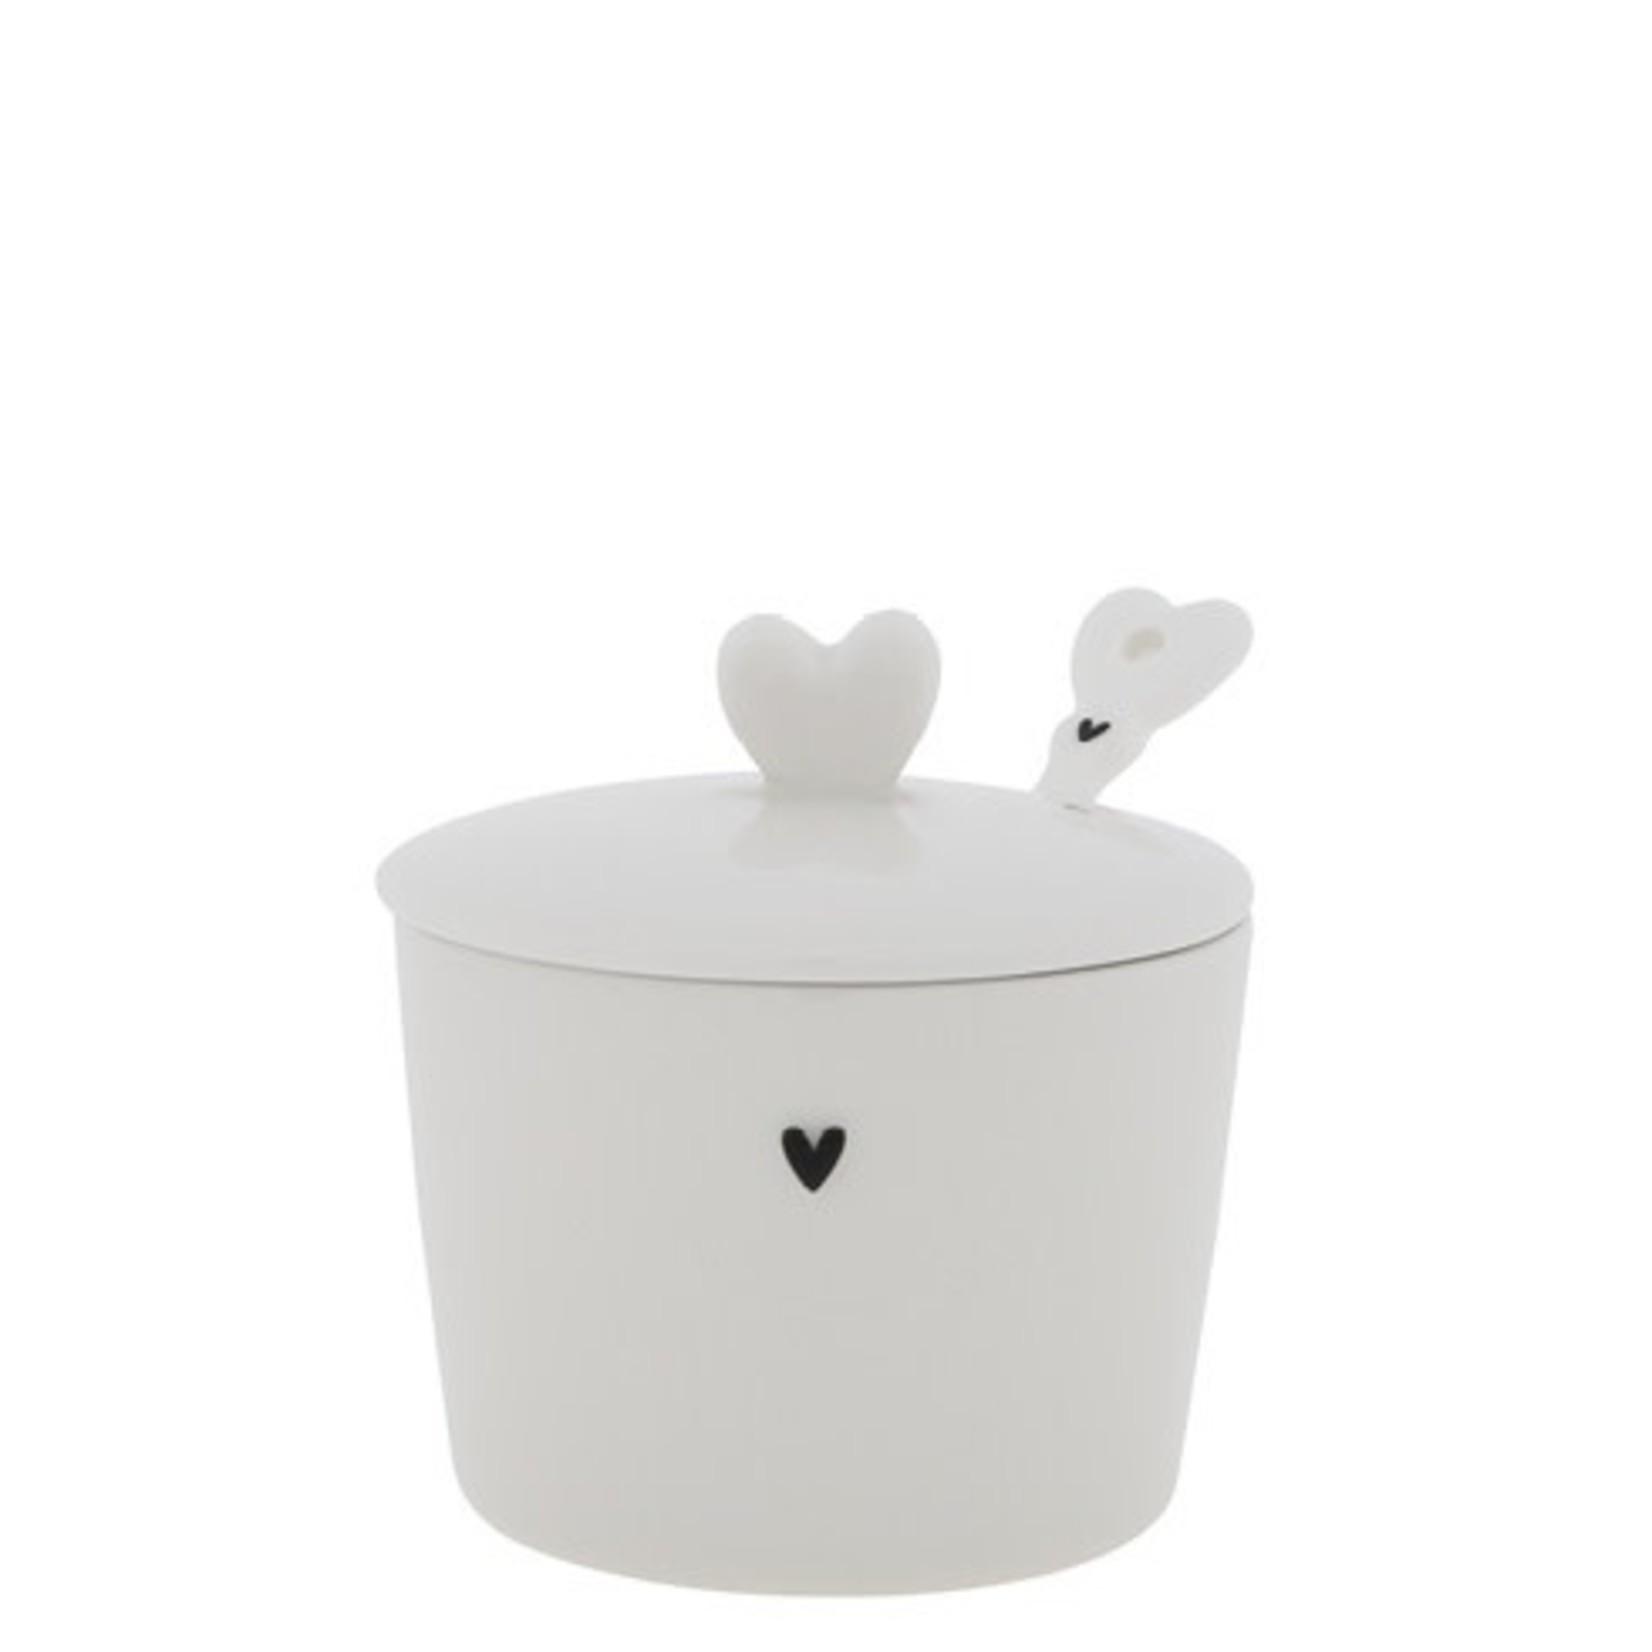 Bastion Collections Sugar Bowl hearts black/white 7x8.5x7 cm